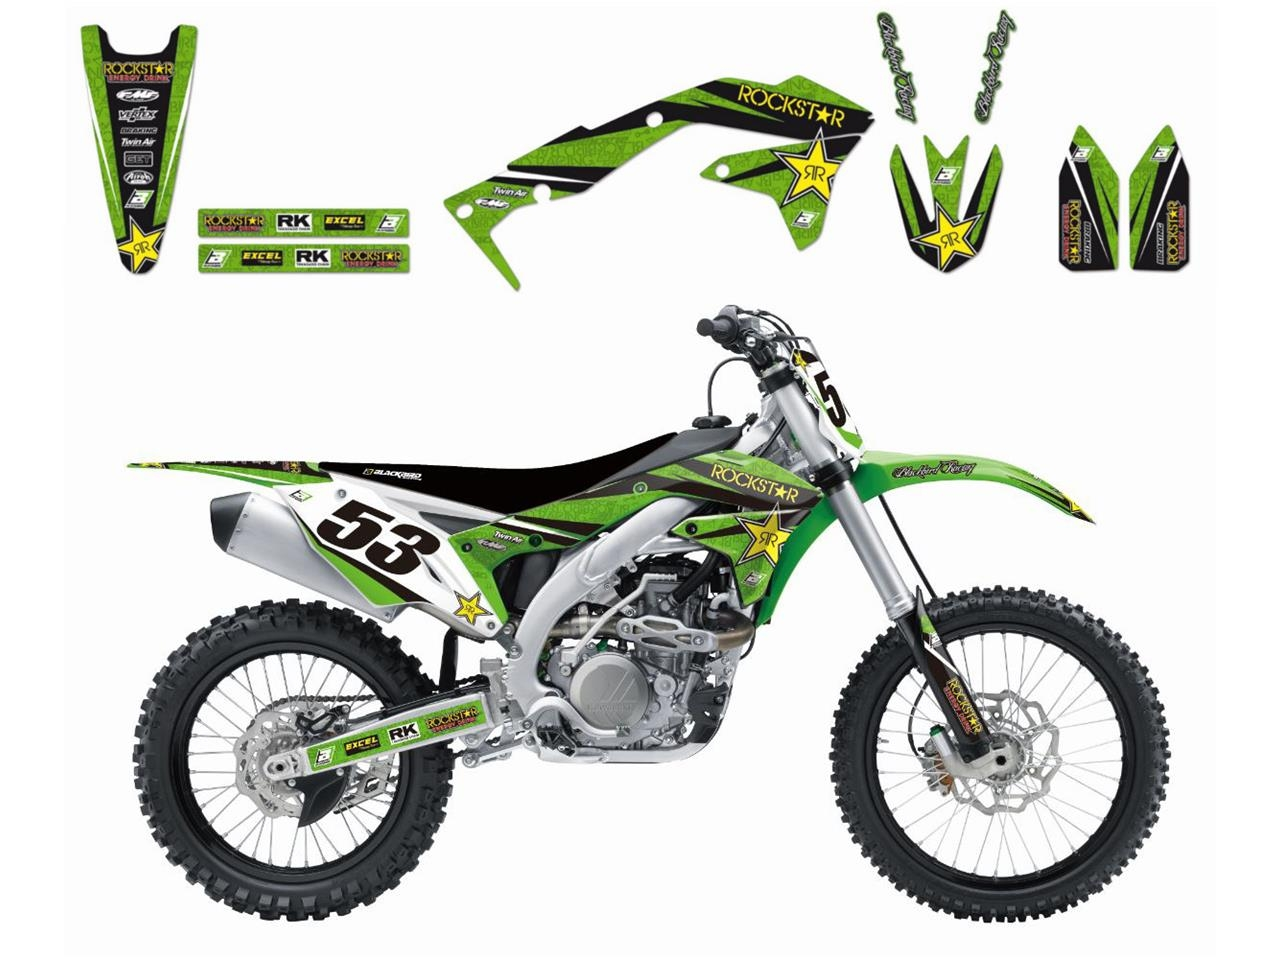 Kit déco Blackbird Rockstar Energy Kawasaki 250 KX-F 17-18 vert